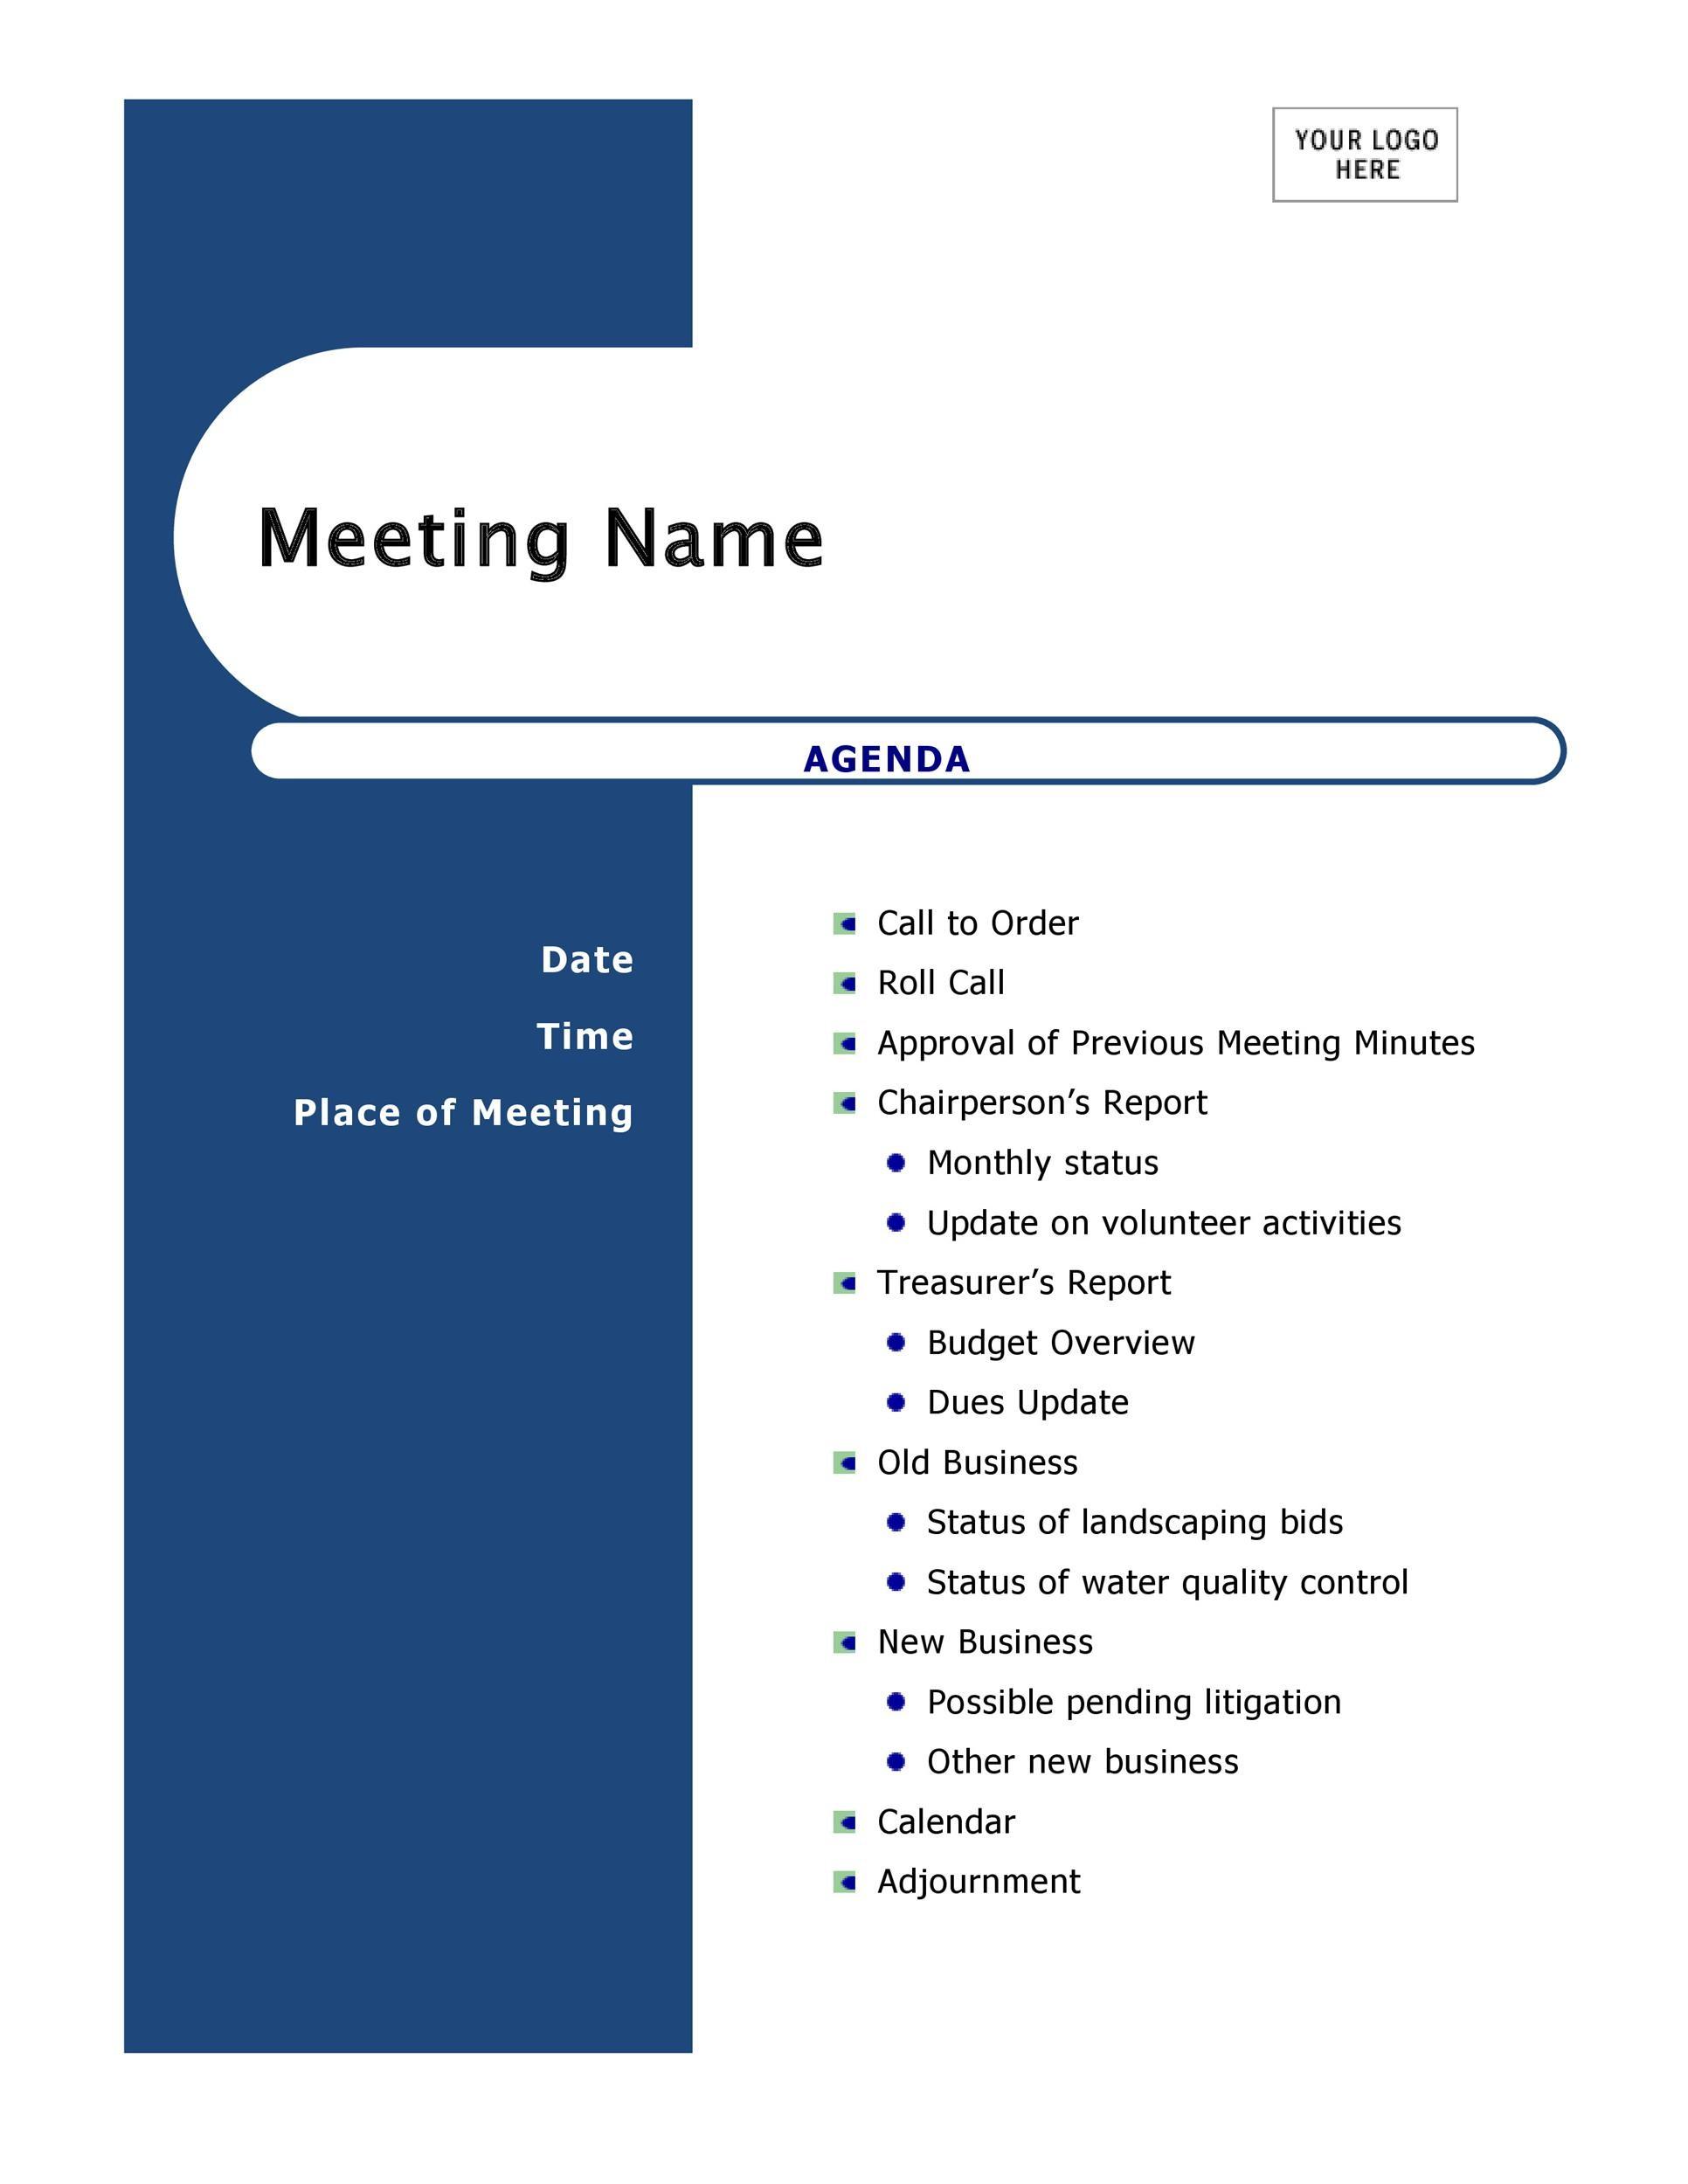 80+ free meeting agenda templates. 46 Effective Meeting Agenda Templates Á… Templatelab